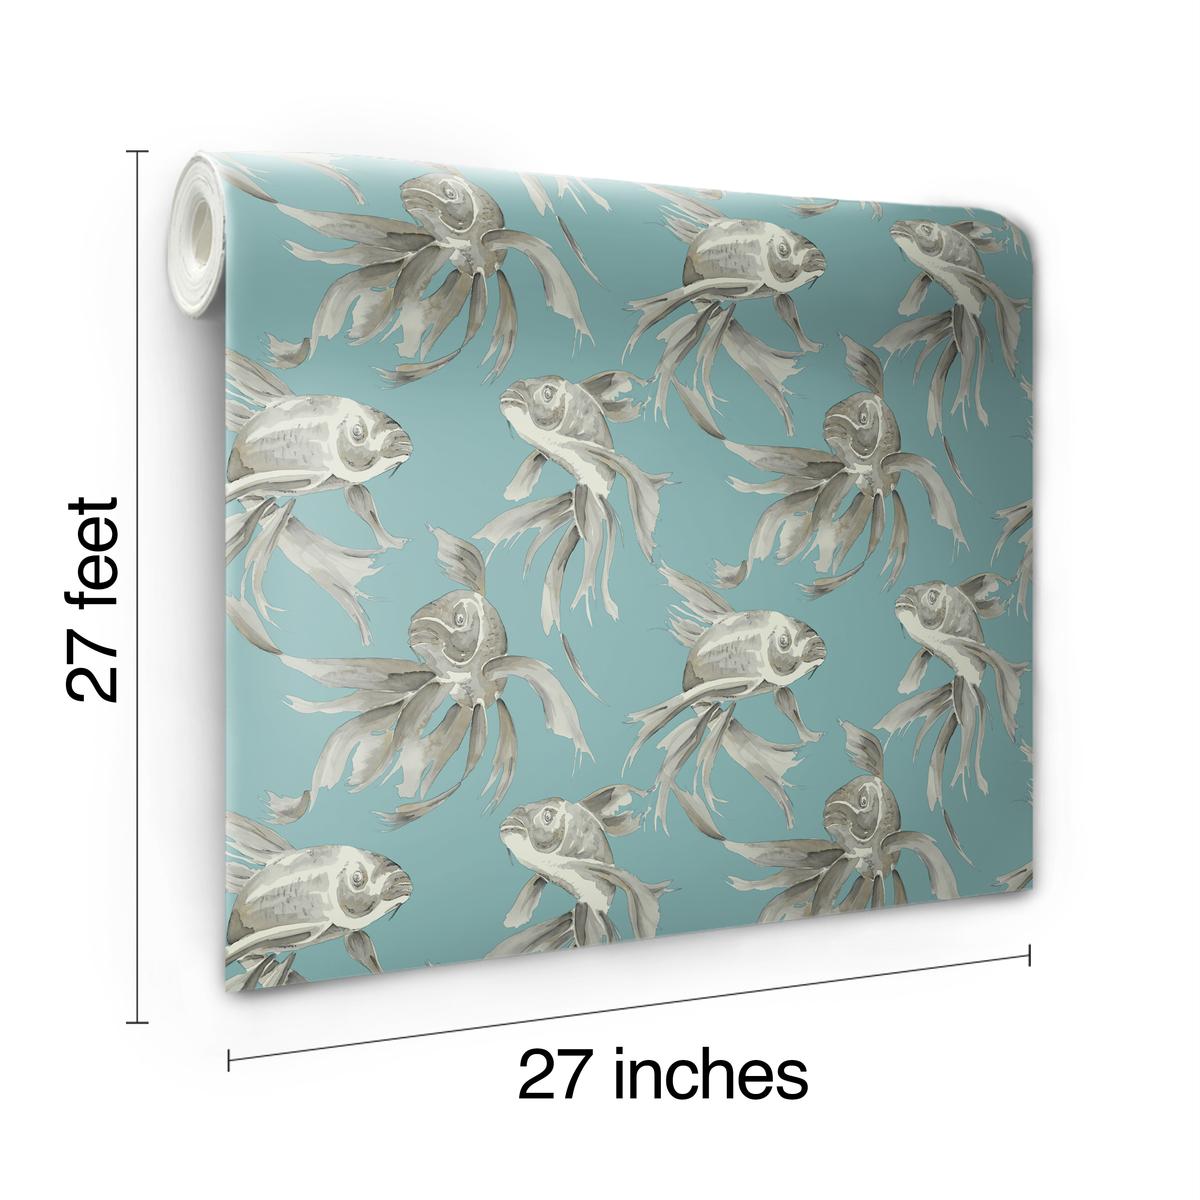 Candice Olson Blue Living Rooms: York SO2403 Candice Olson Tranquil Koi Wallpaper, Blue